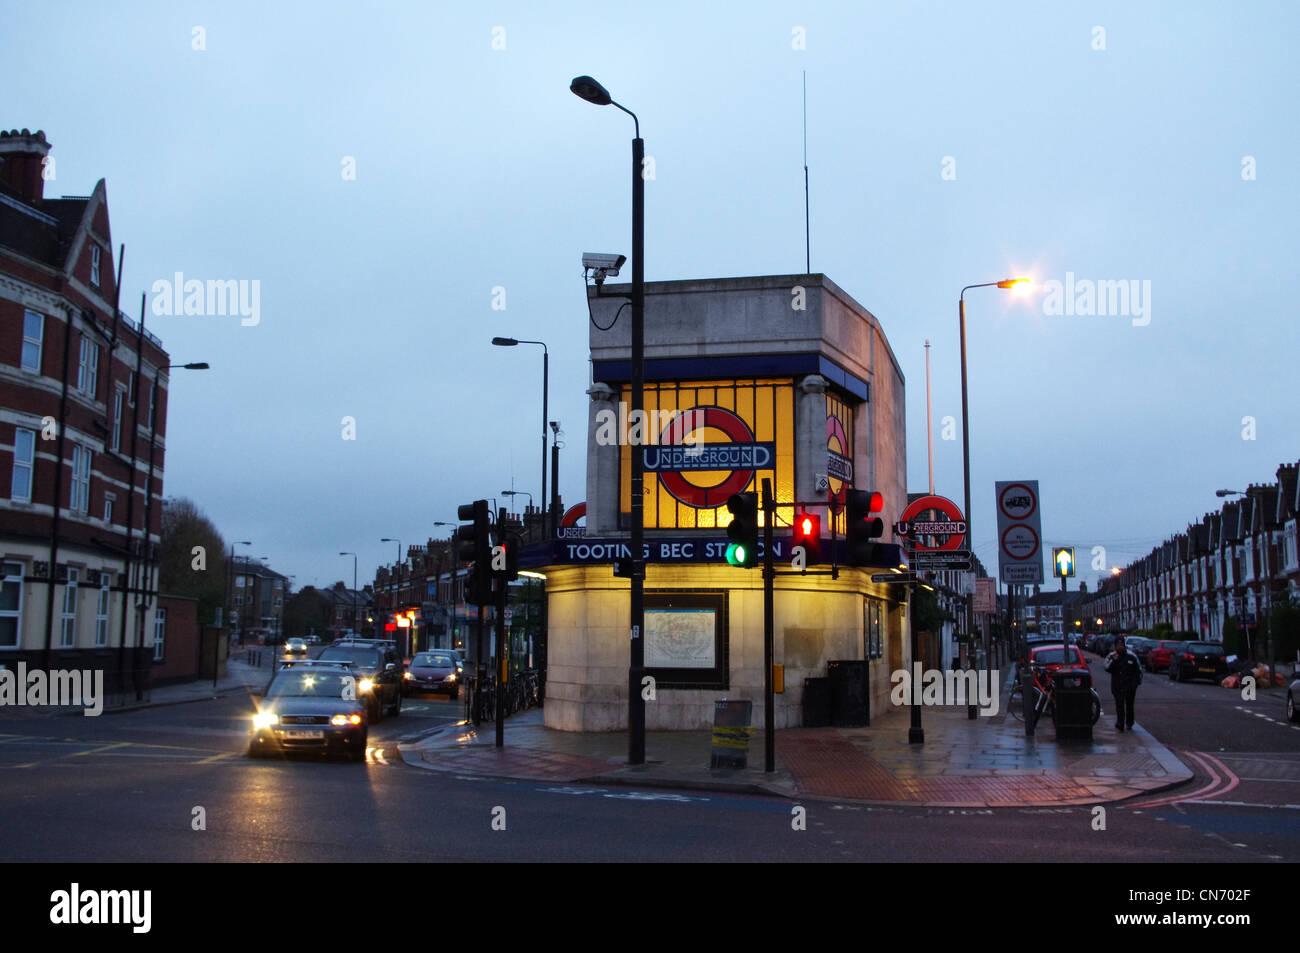 Tooting Bec Tube Station - Stock Image